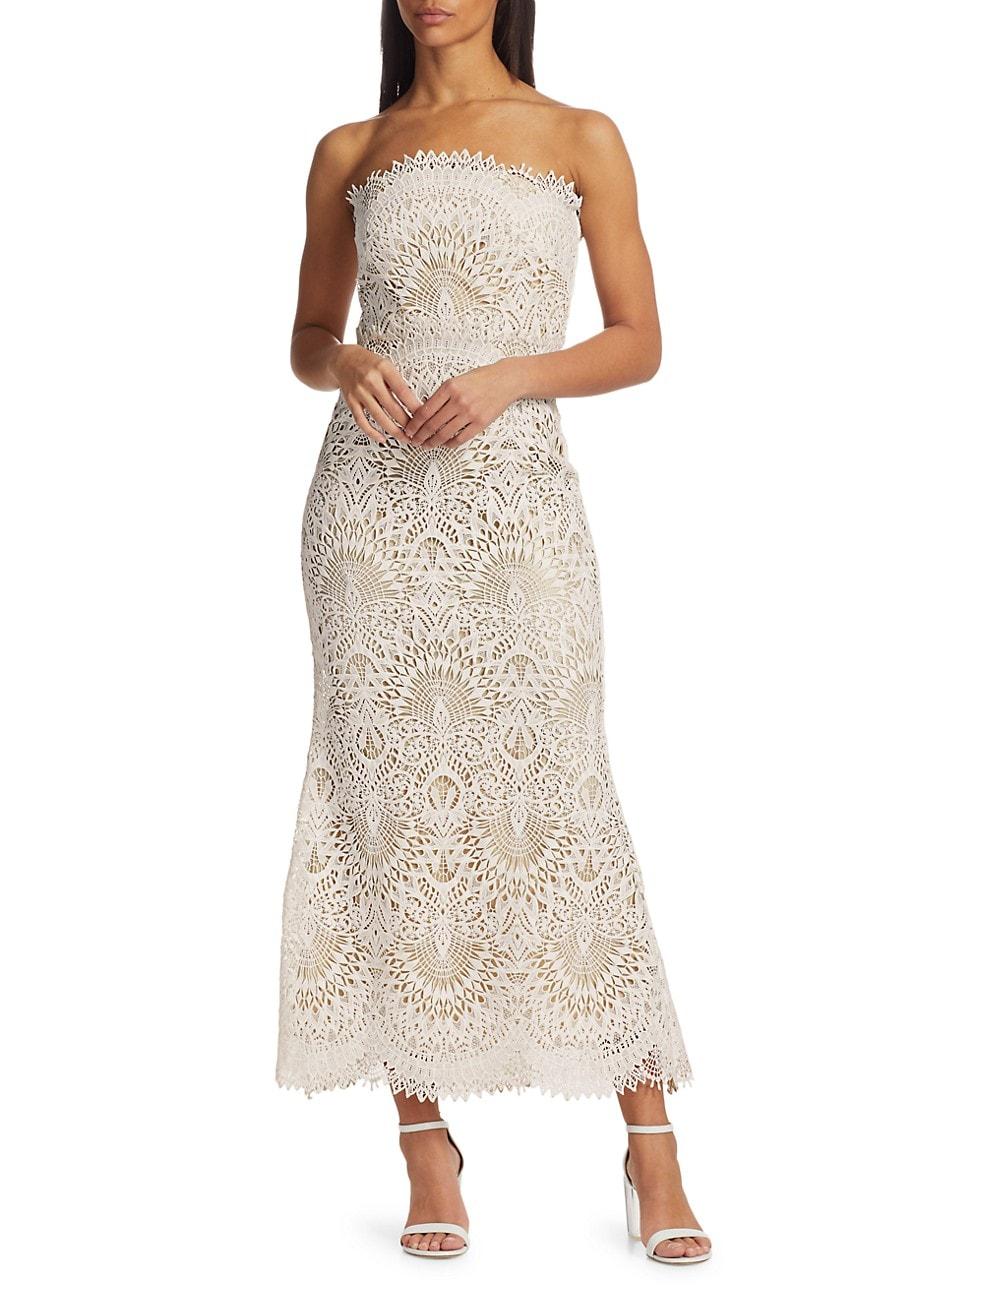 Badgley Mischka Lace Strapless Mermaid Dress